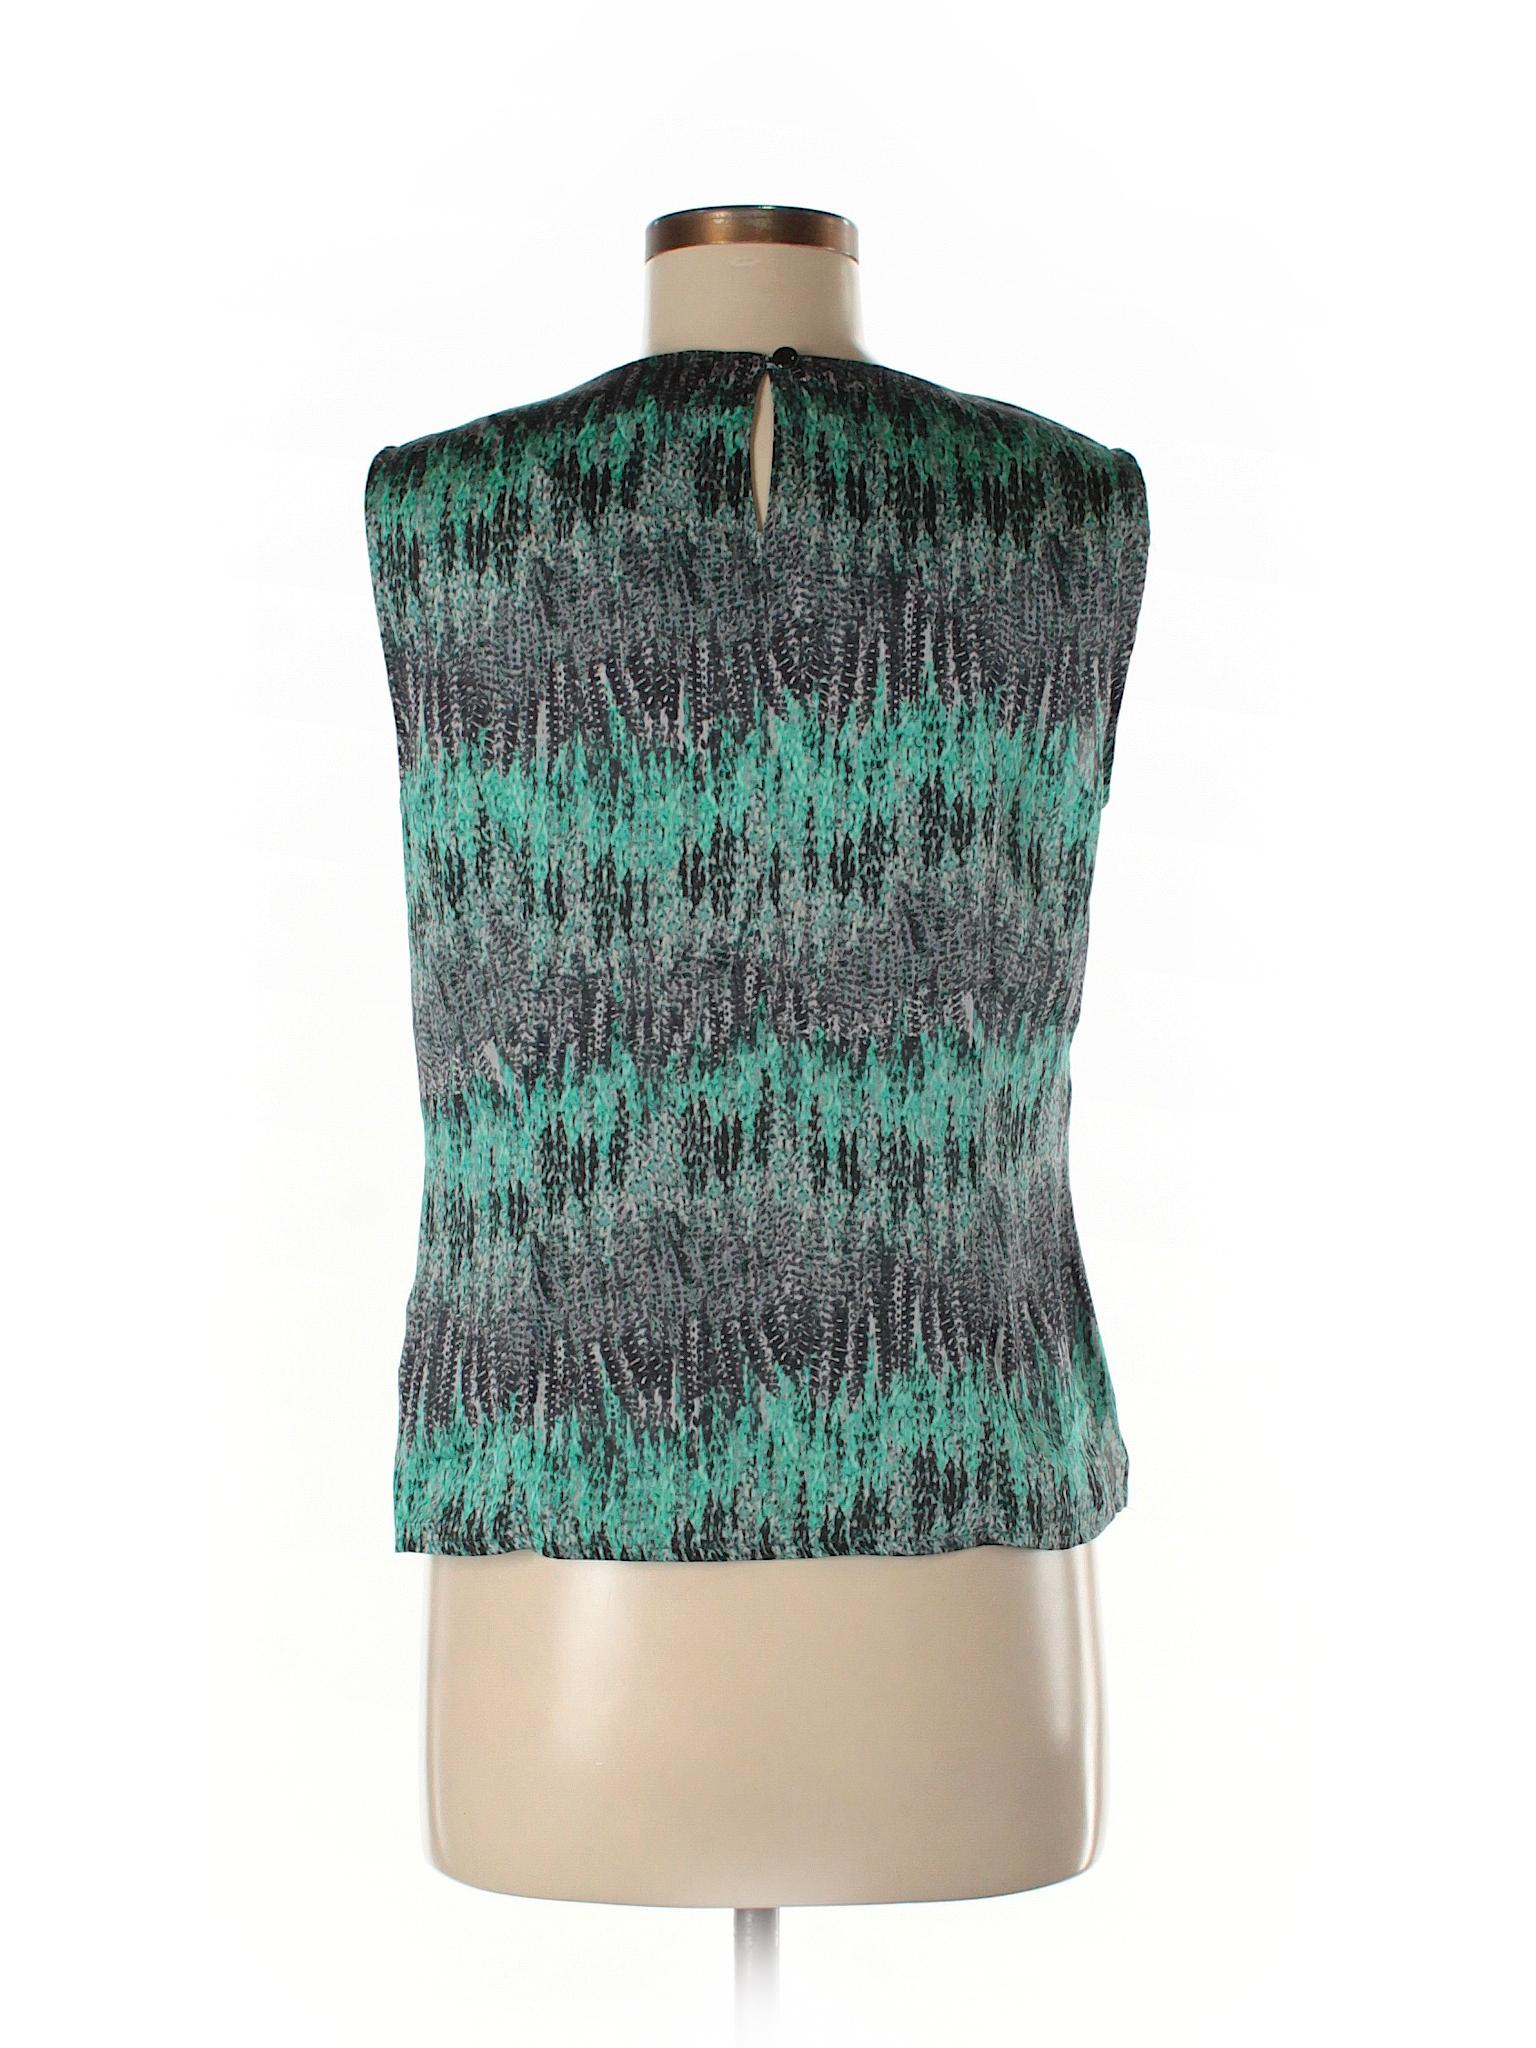 ac3903de9234e Kasper 100% Polyester Print Teal Sleeveless Blouse Size M (Petite) - 84%  off